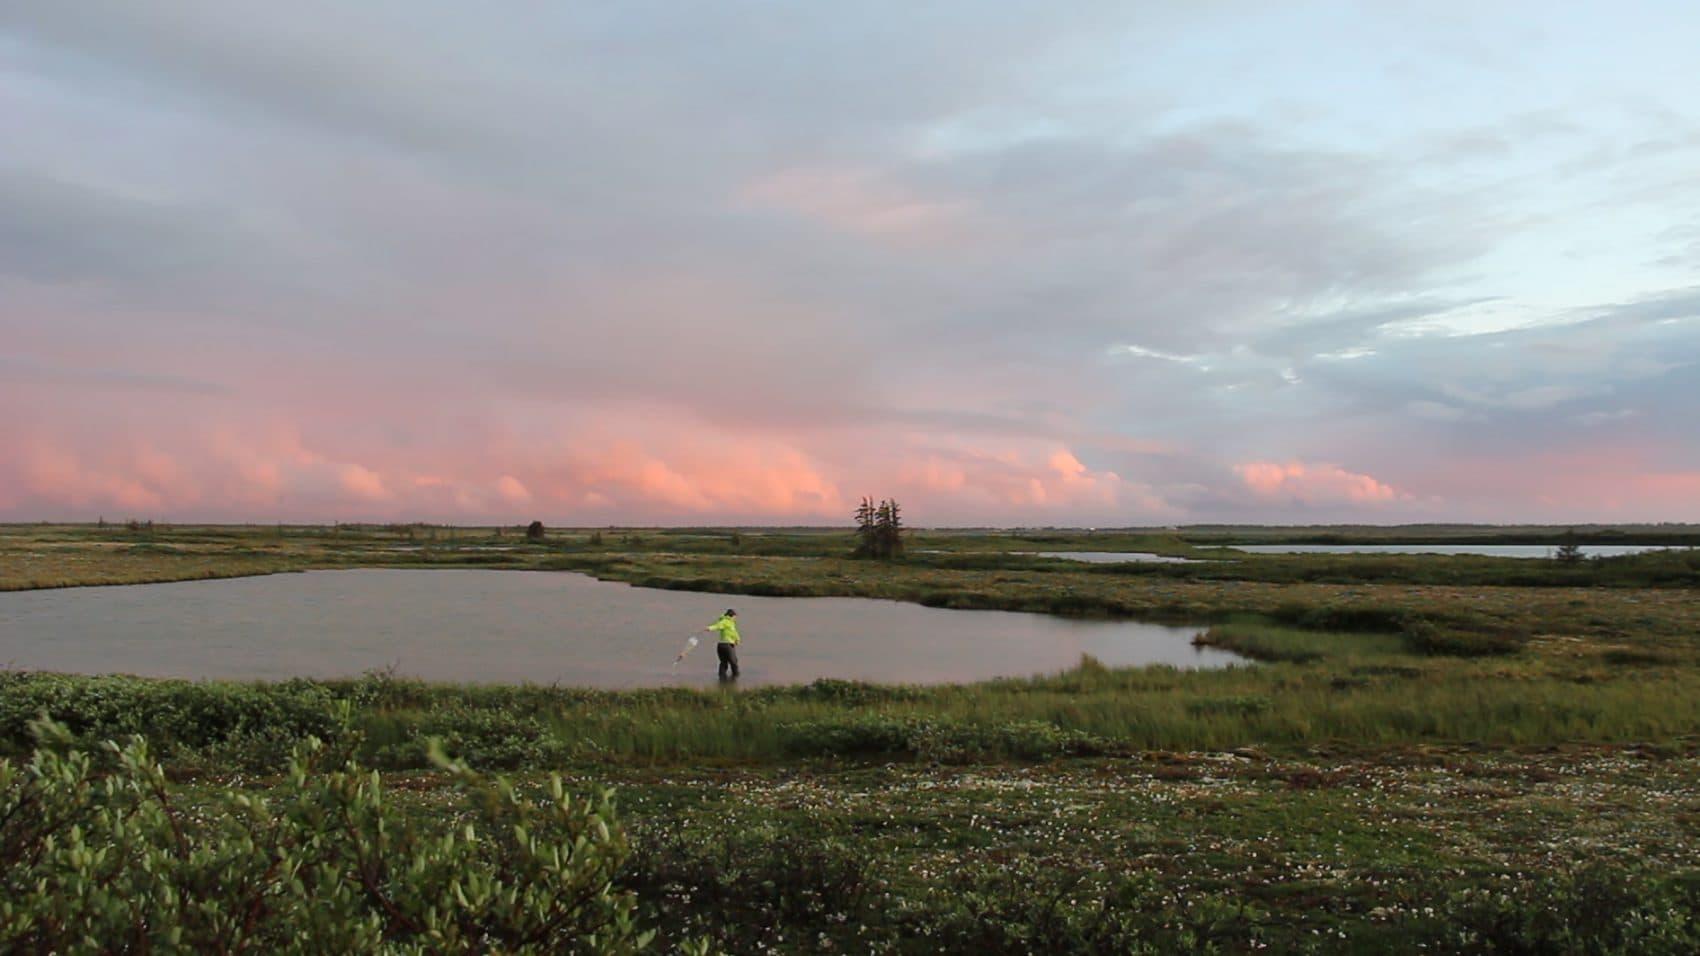 A researcher collects Daphnia samples in Manitoba. (Courtesy Allison Maria Rodriguez)